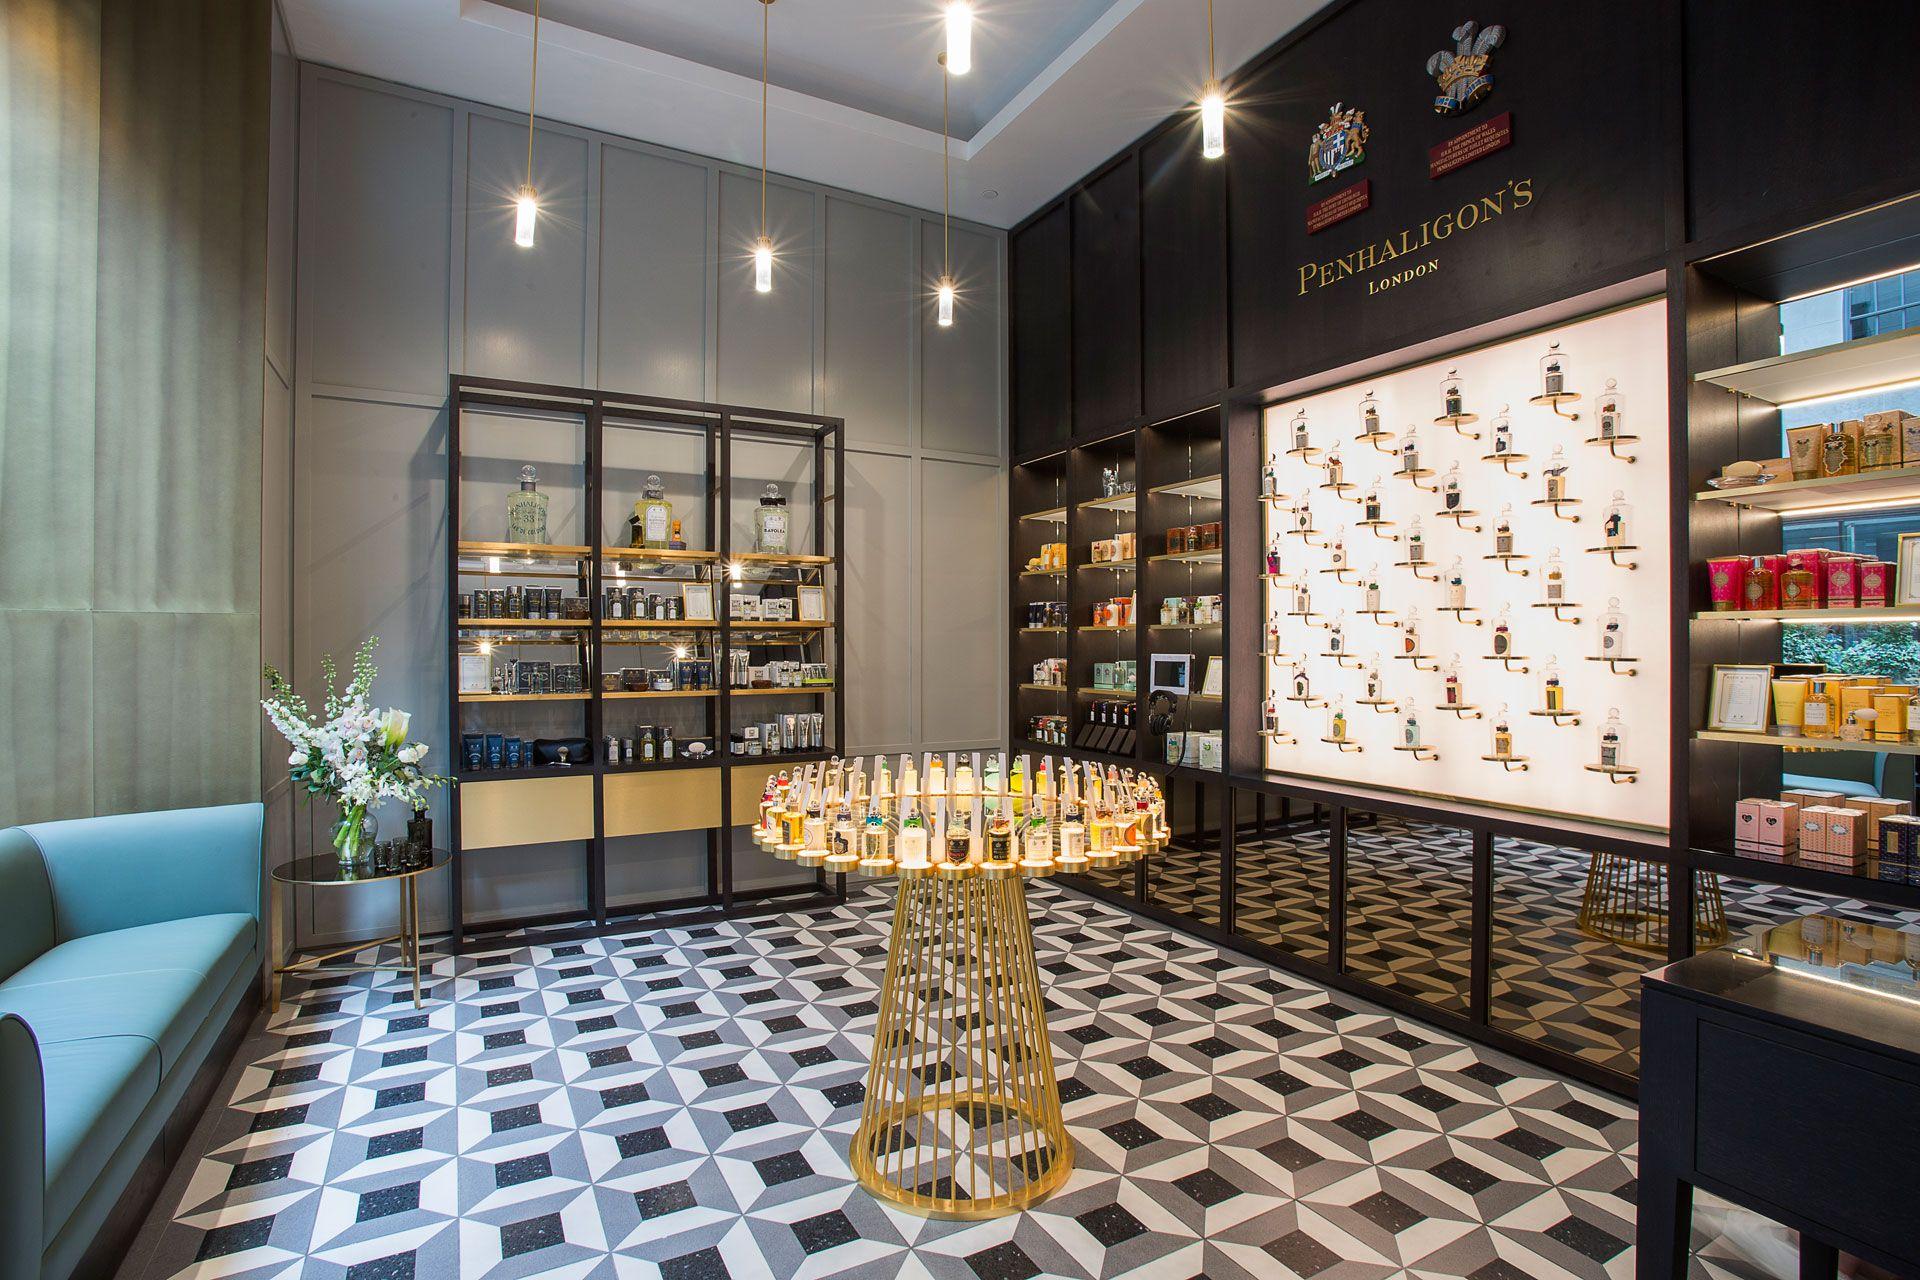 Royal perfumer Penhaligon's opens up in New York